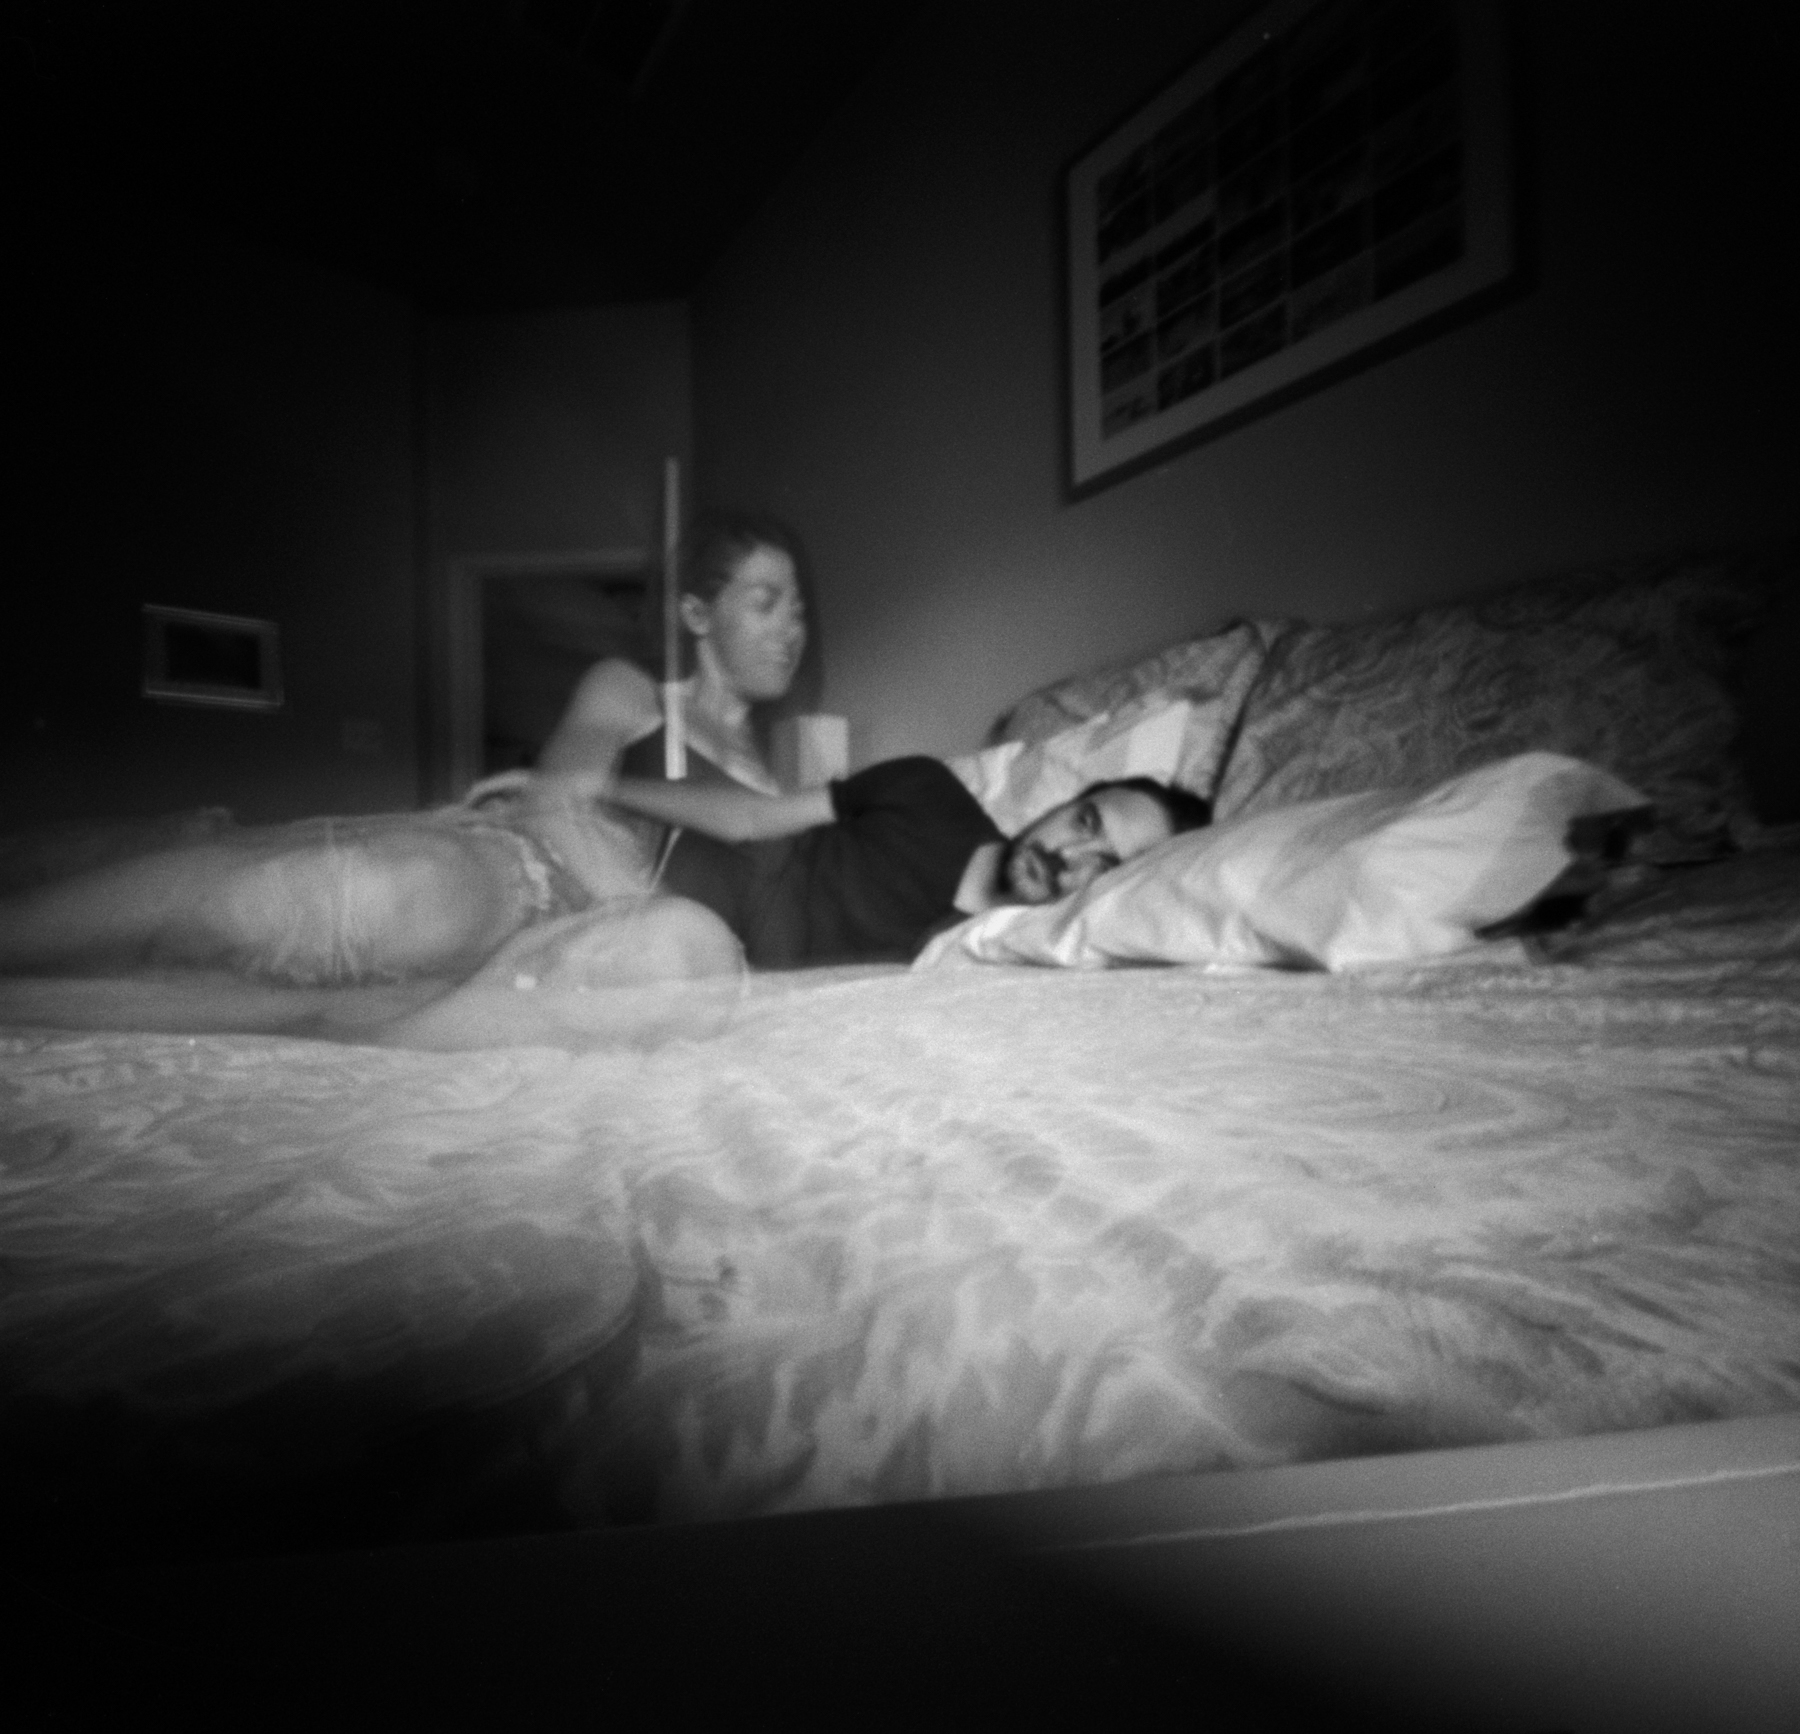 Sunday Afternoon | Ondu 6x6 | Kodak Tri-X | Amy Jasek